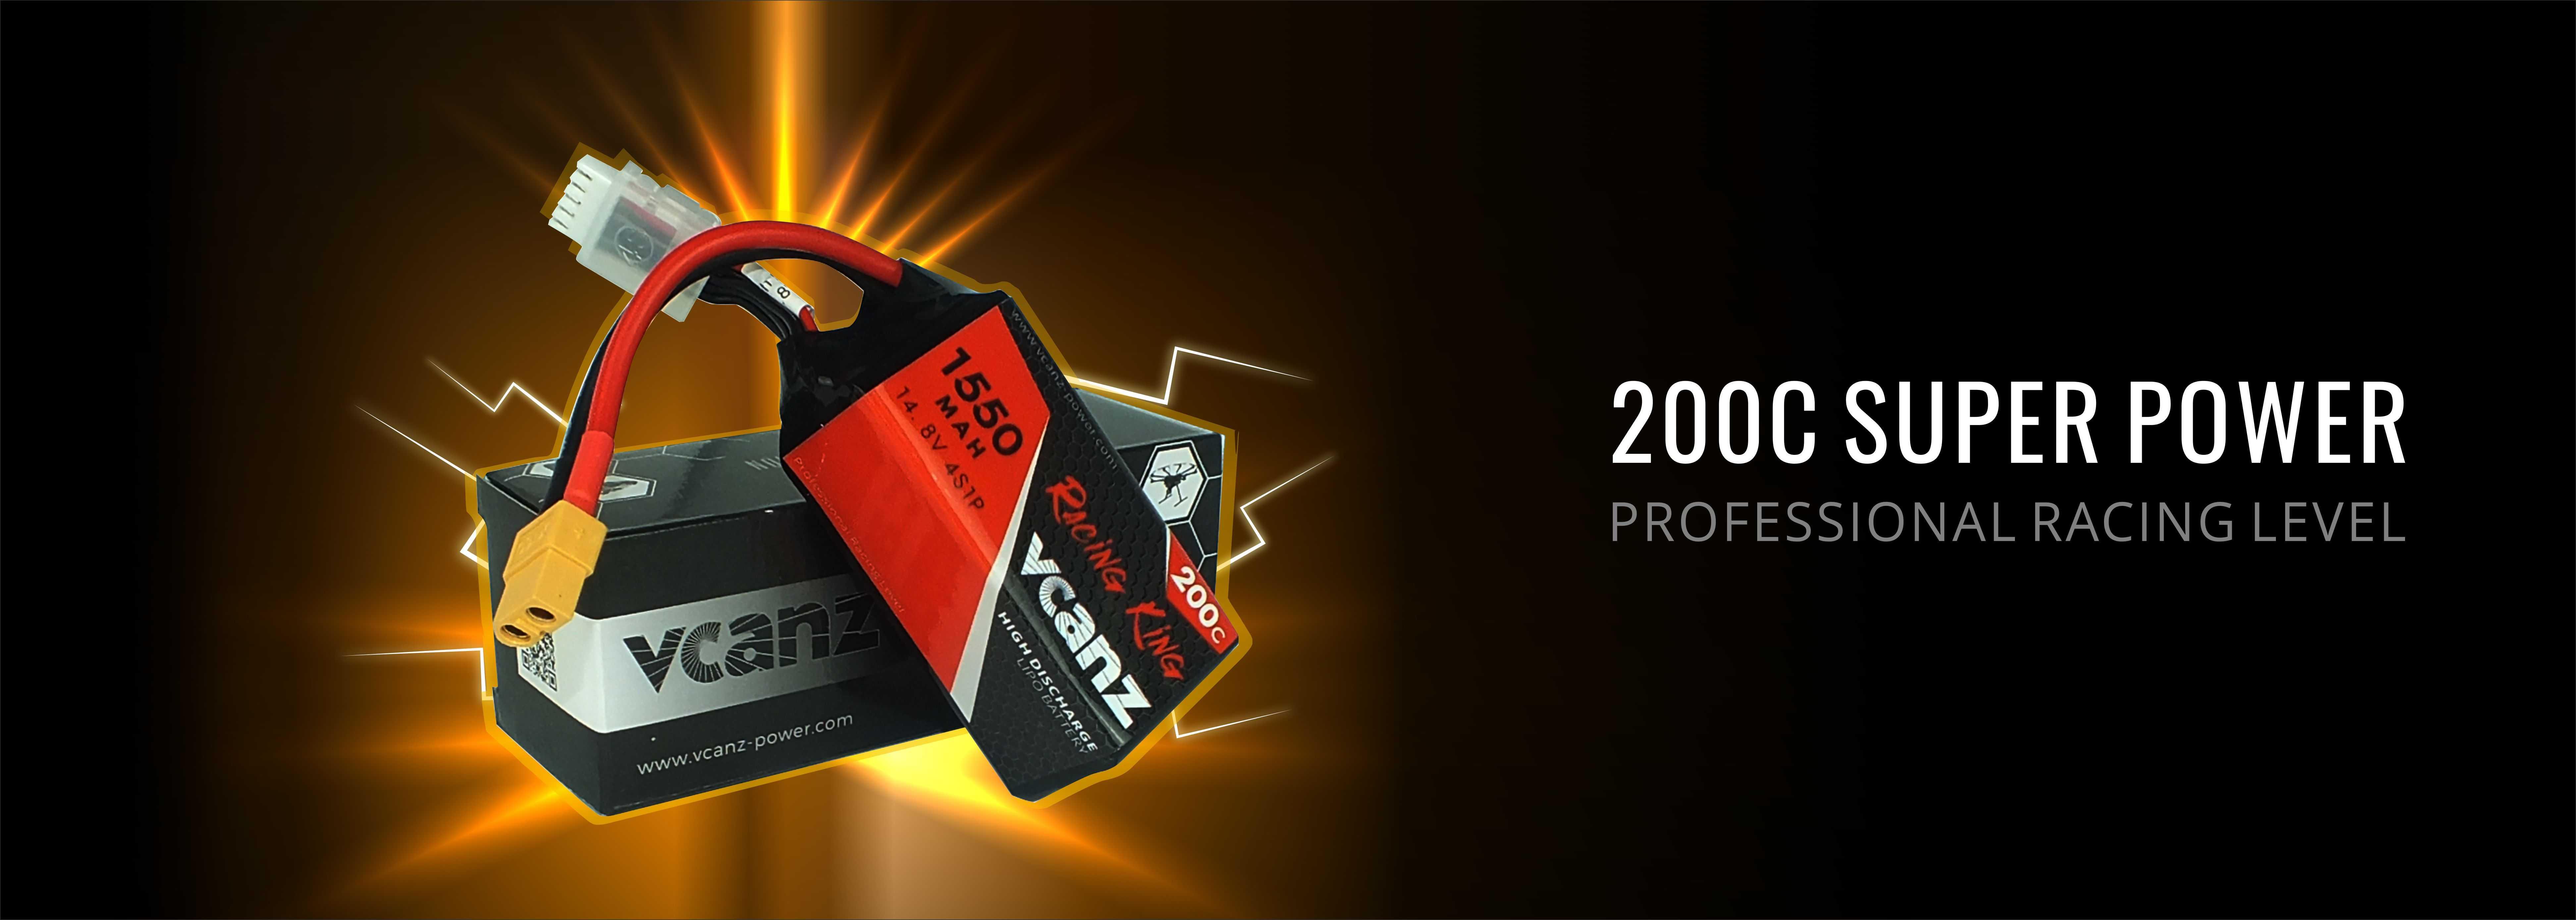 Vcanz 200C Lipo Battery